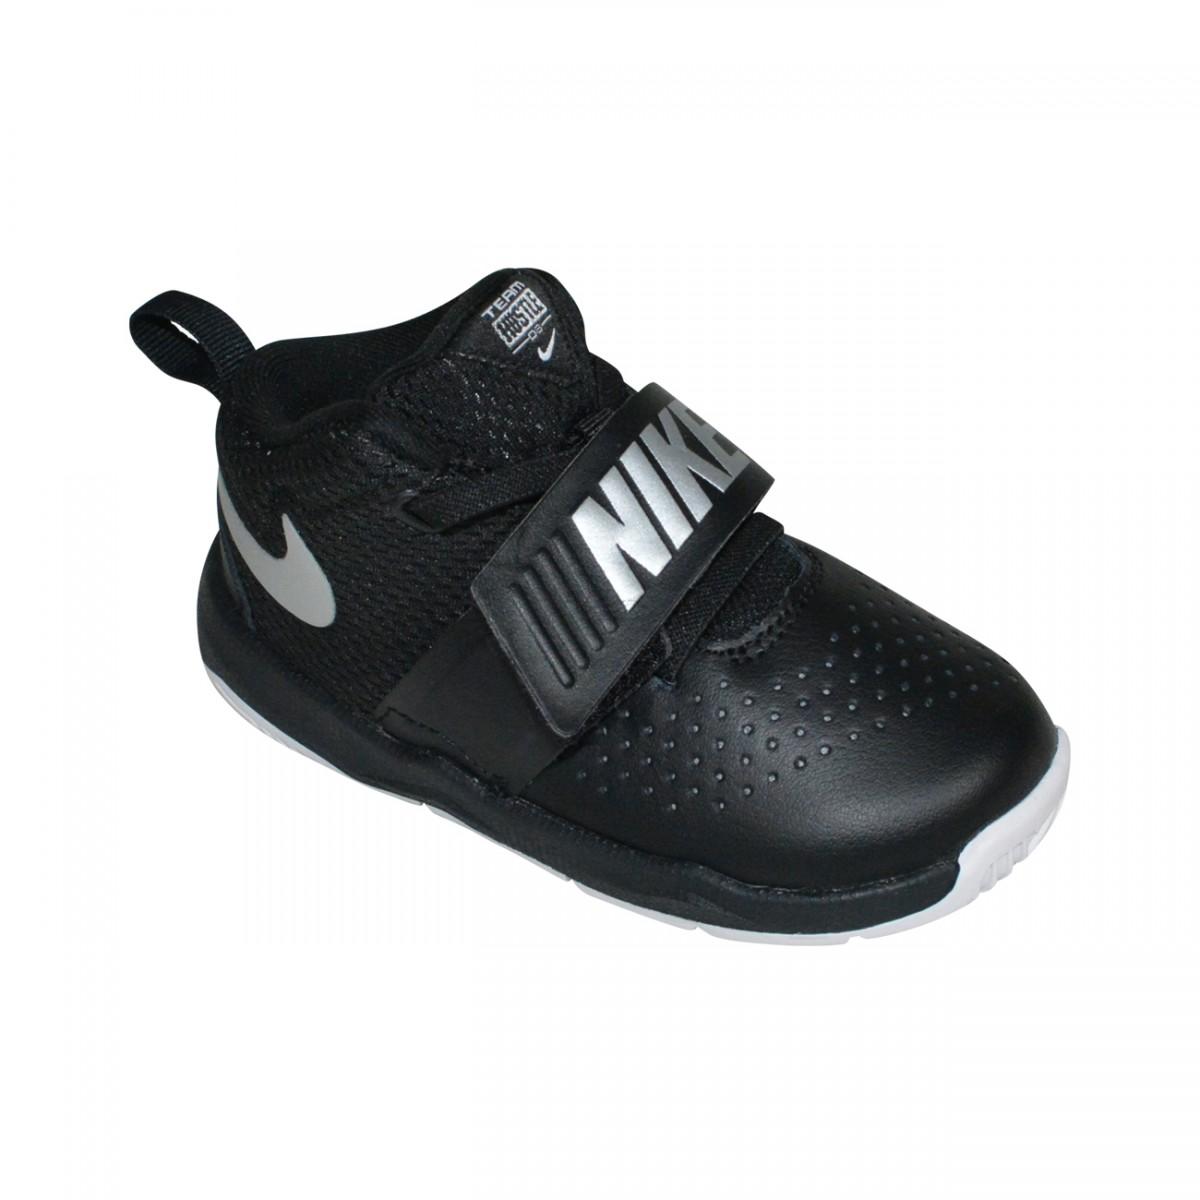 4d90944f66a Tenis Nike Team Hustle D8 TD Infantil 881943 001 - Preto Preto Prata - Chuteira  Nike